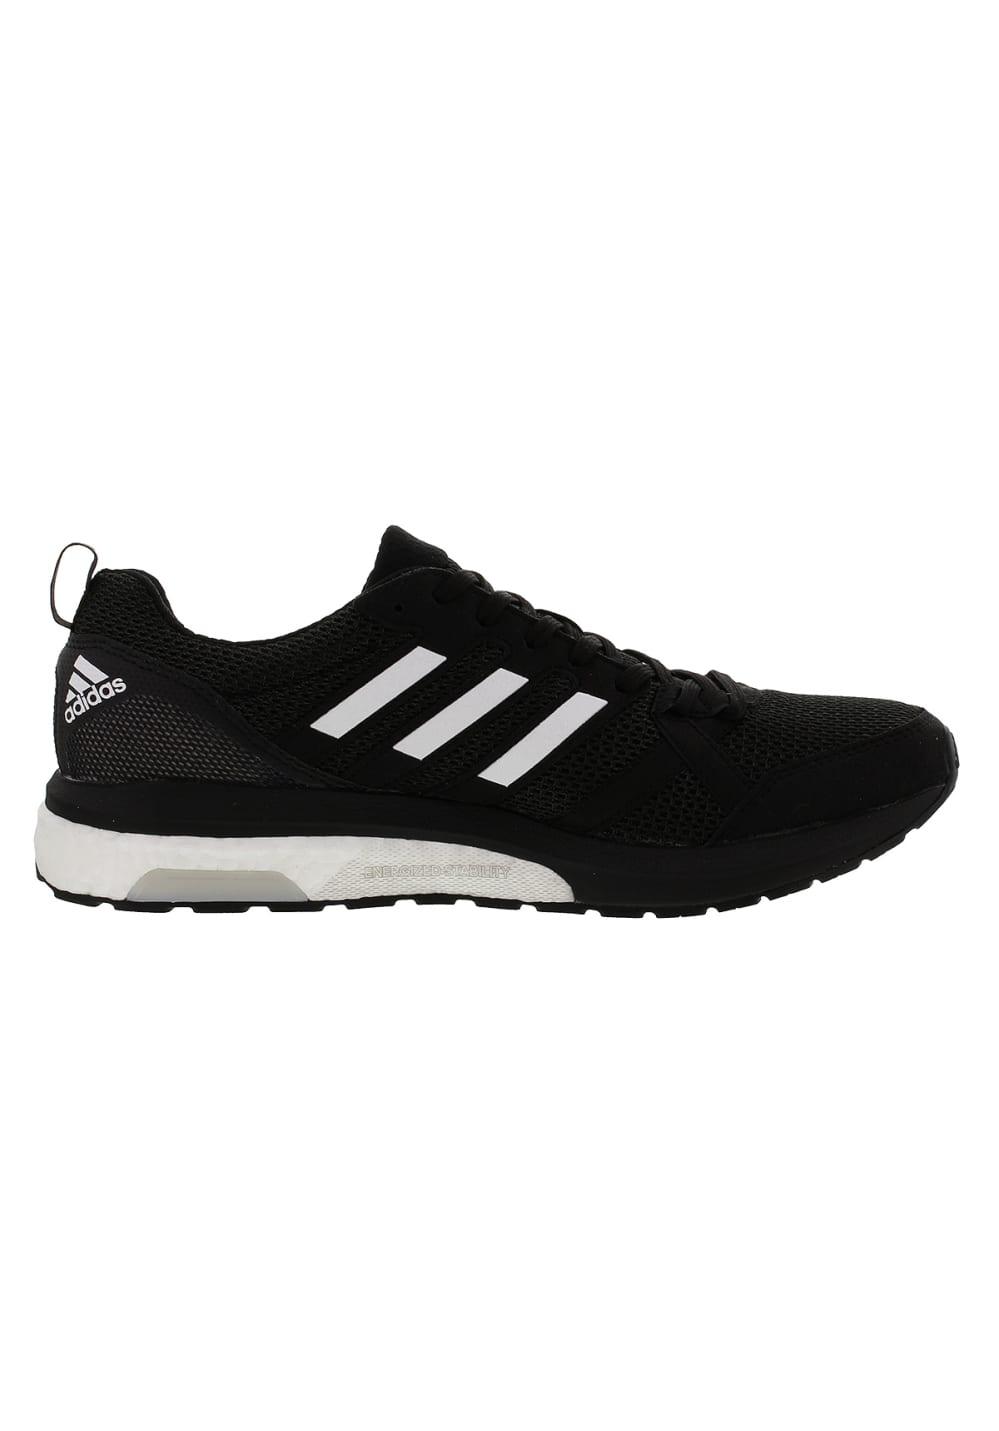 sale retailer 751db 4050a adidas adiZero Tempo 9 - Running shoes for Men - Black